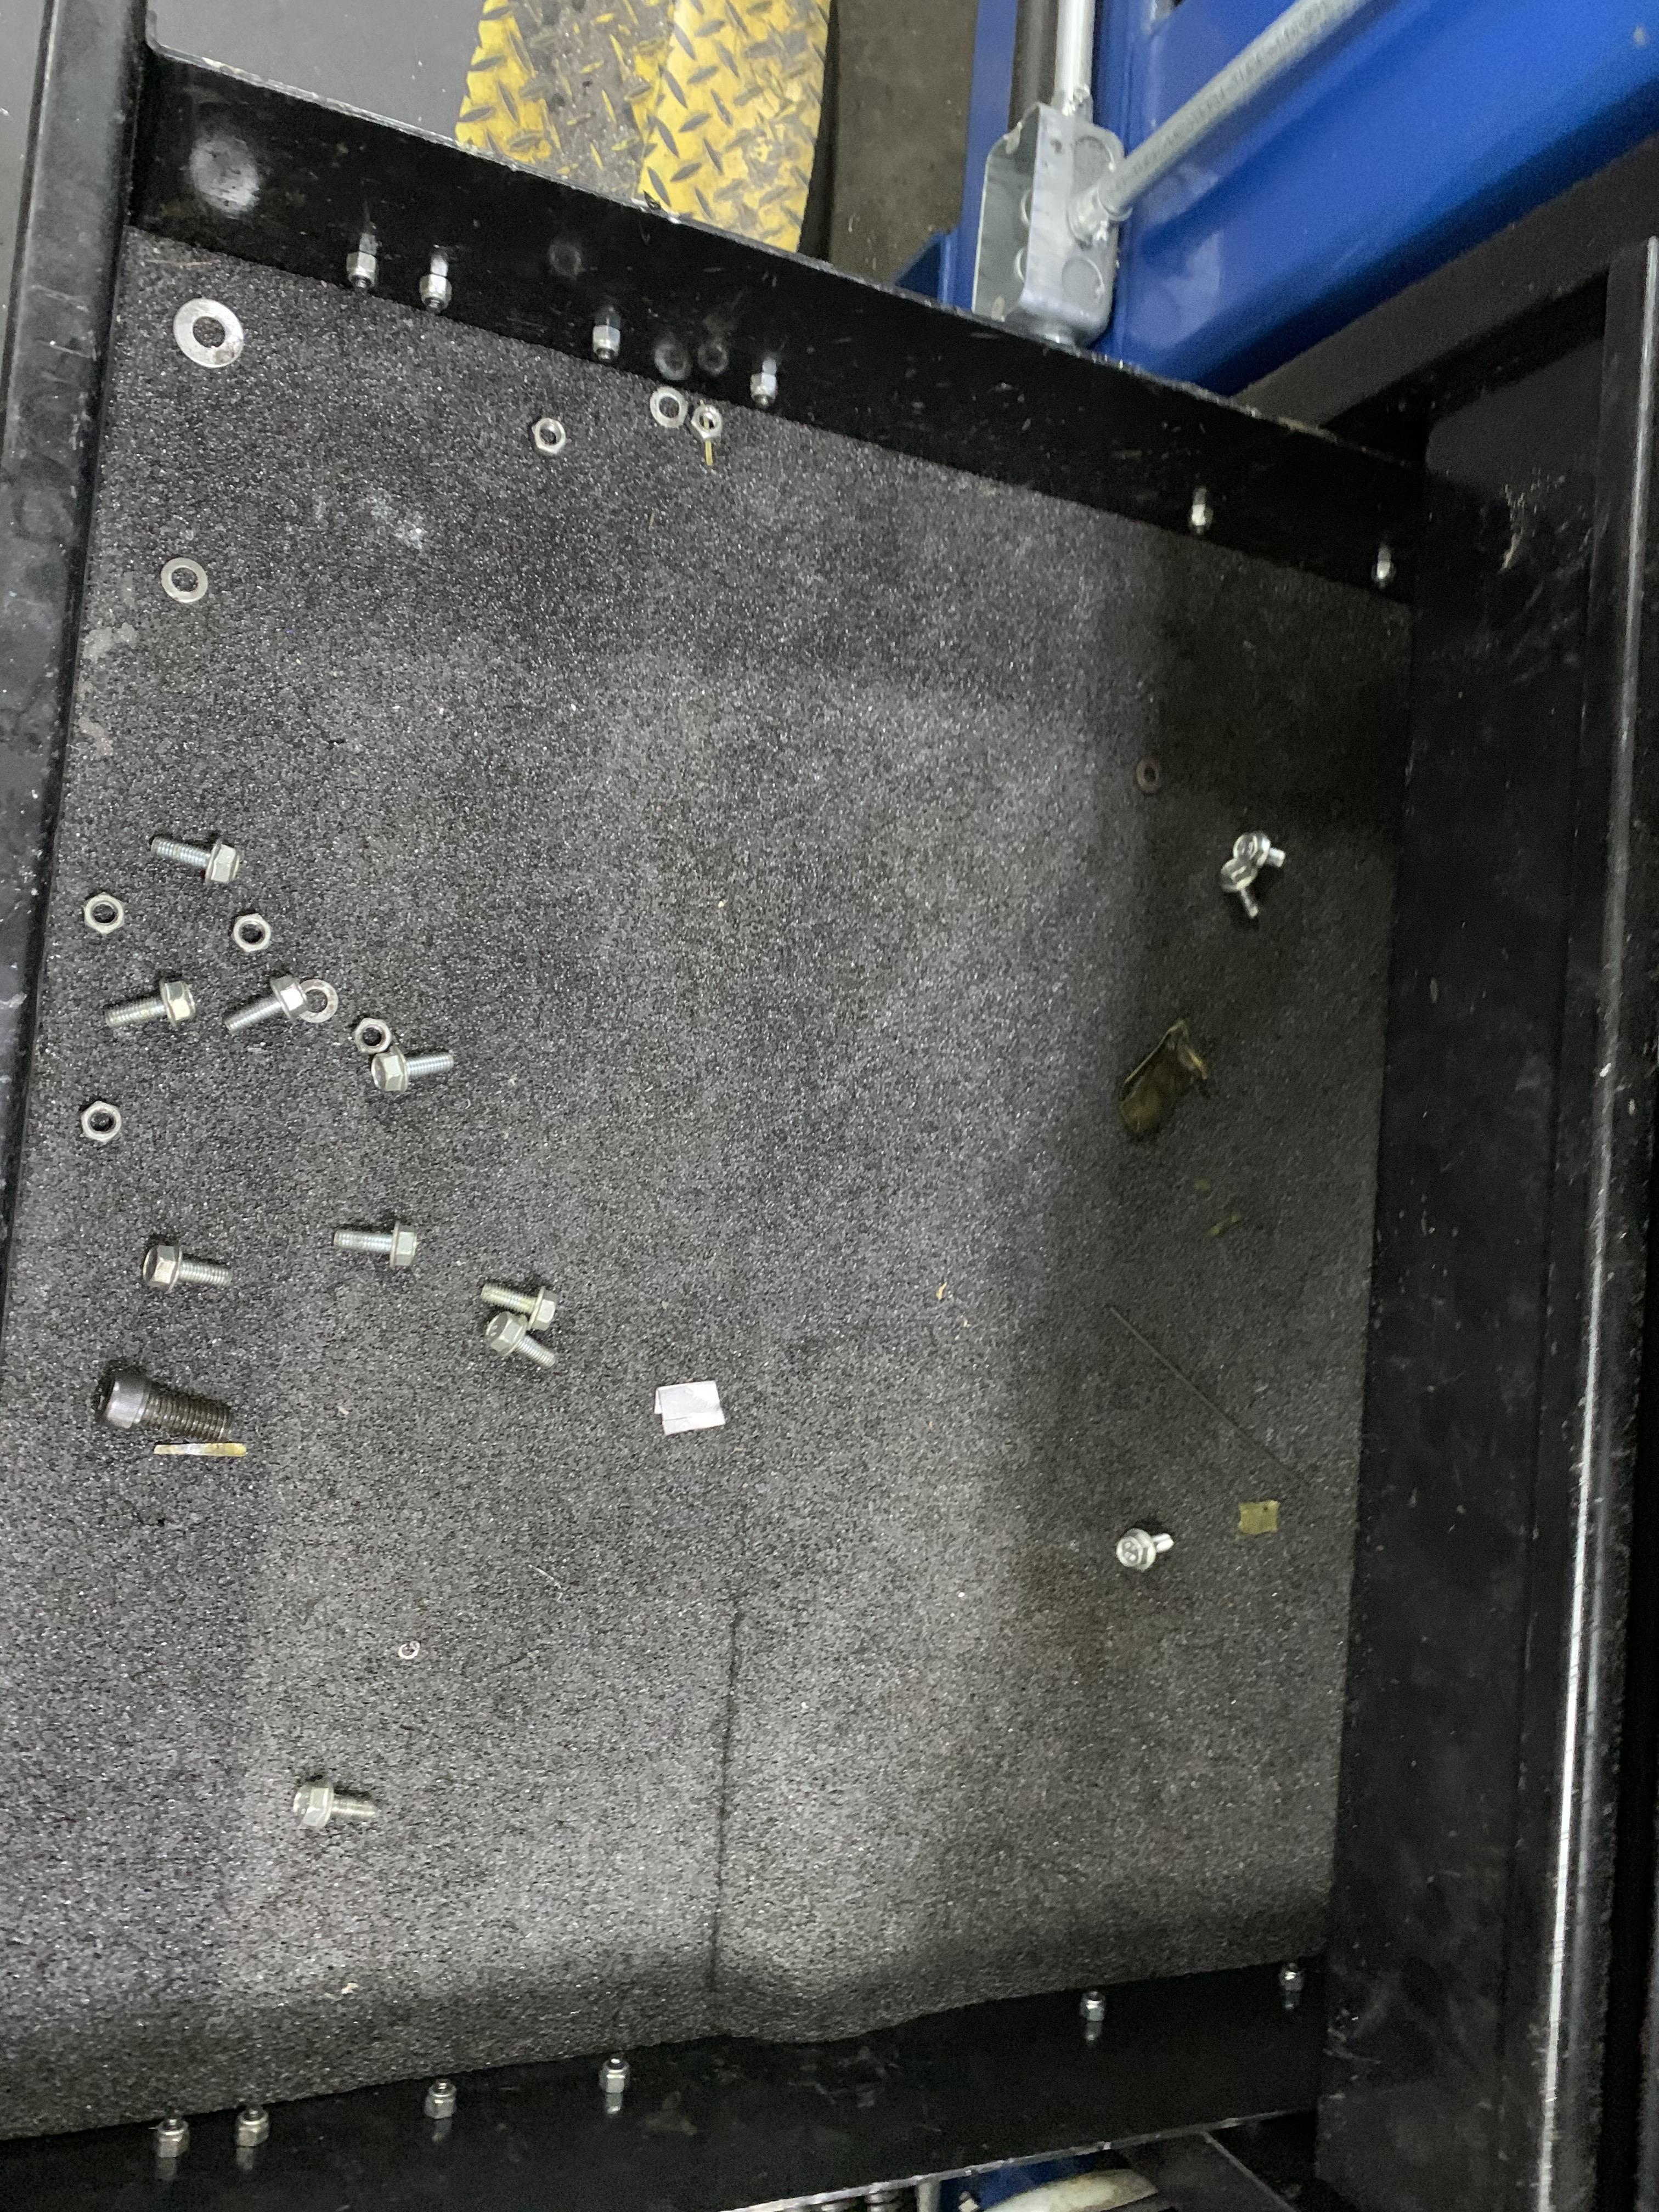 "6"" UNISON MODEL 6"" MS RH ELECTRIC CNC MULTI-STACK TUBE BENDER; S/N 2715, JOB NO. ME 4-410,(NEW 2014) - Image 50 of 72"